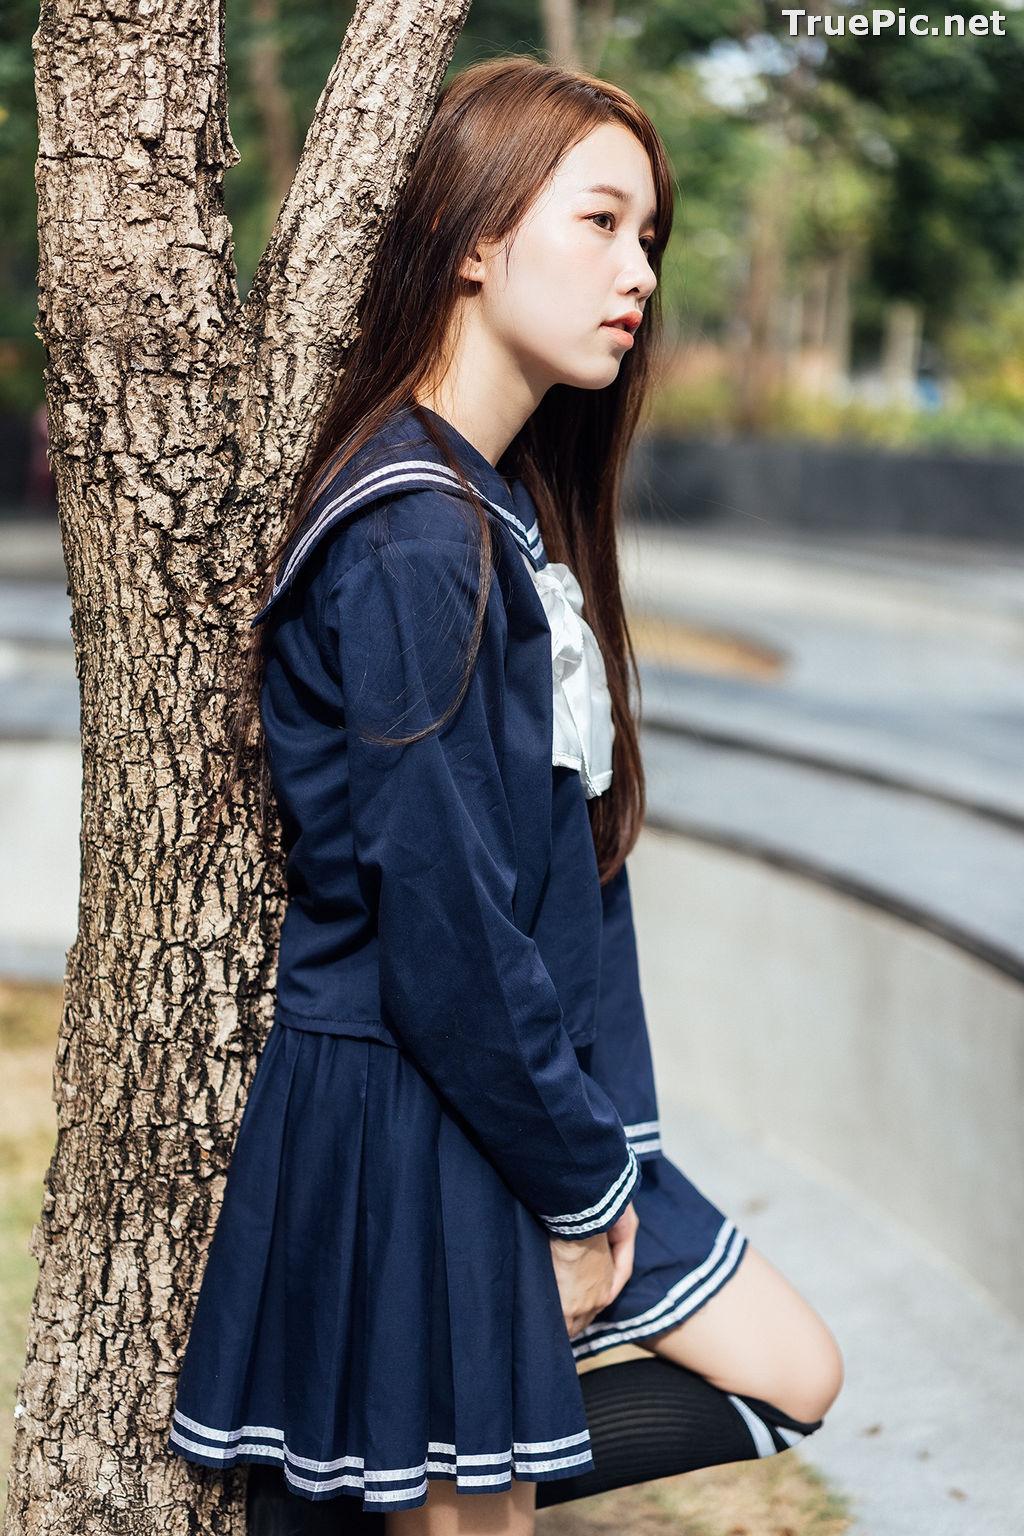 Image Thailand Cute Model - Pimpisa Kitiwini - After School - TruePic.net - Picture-3